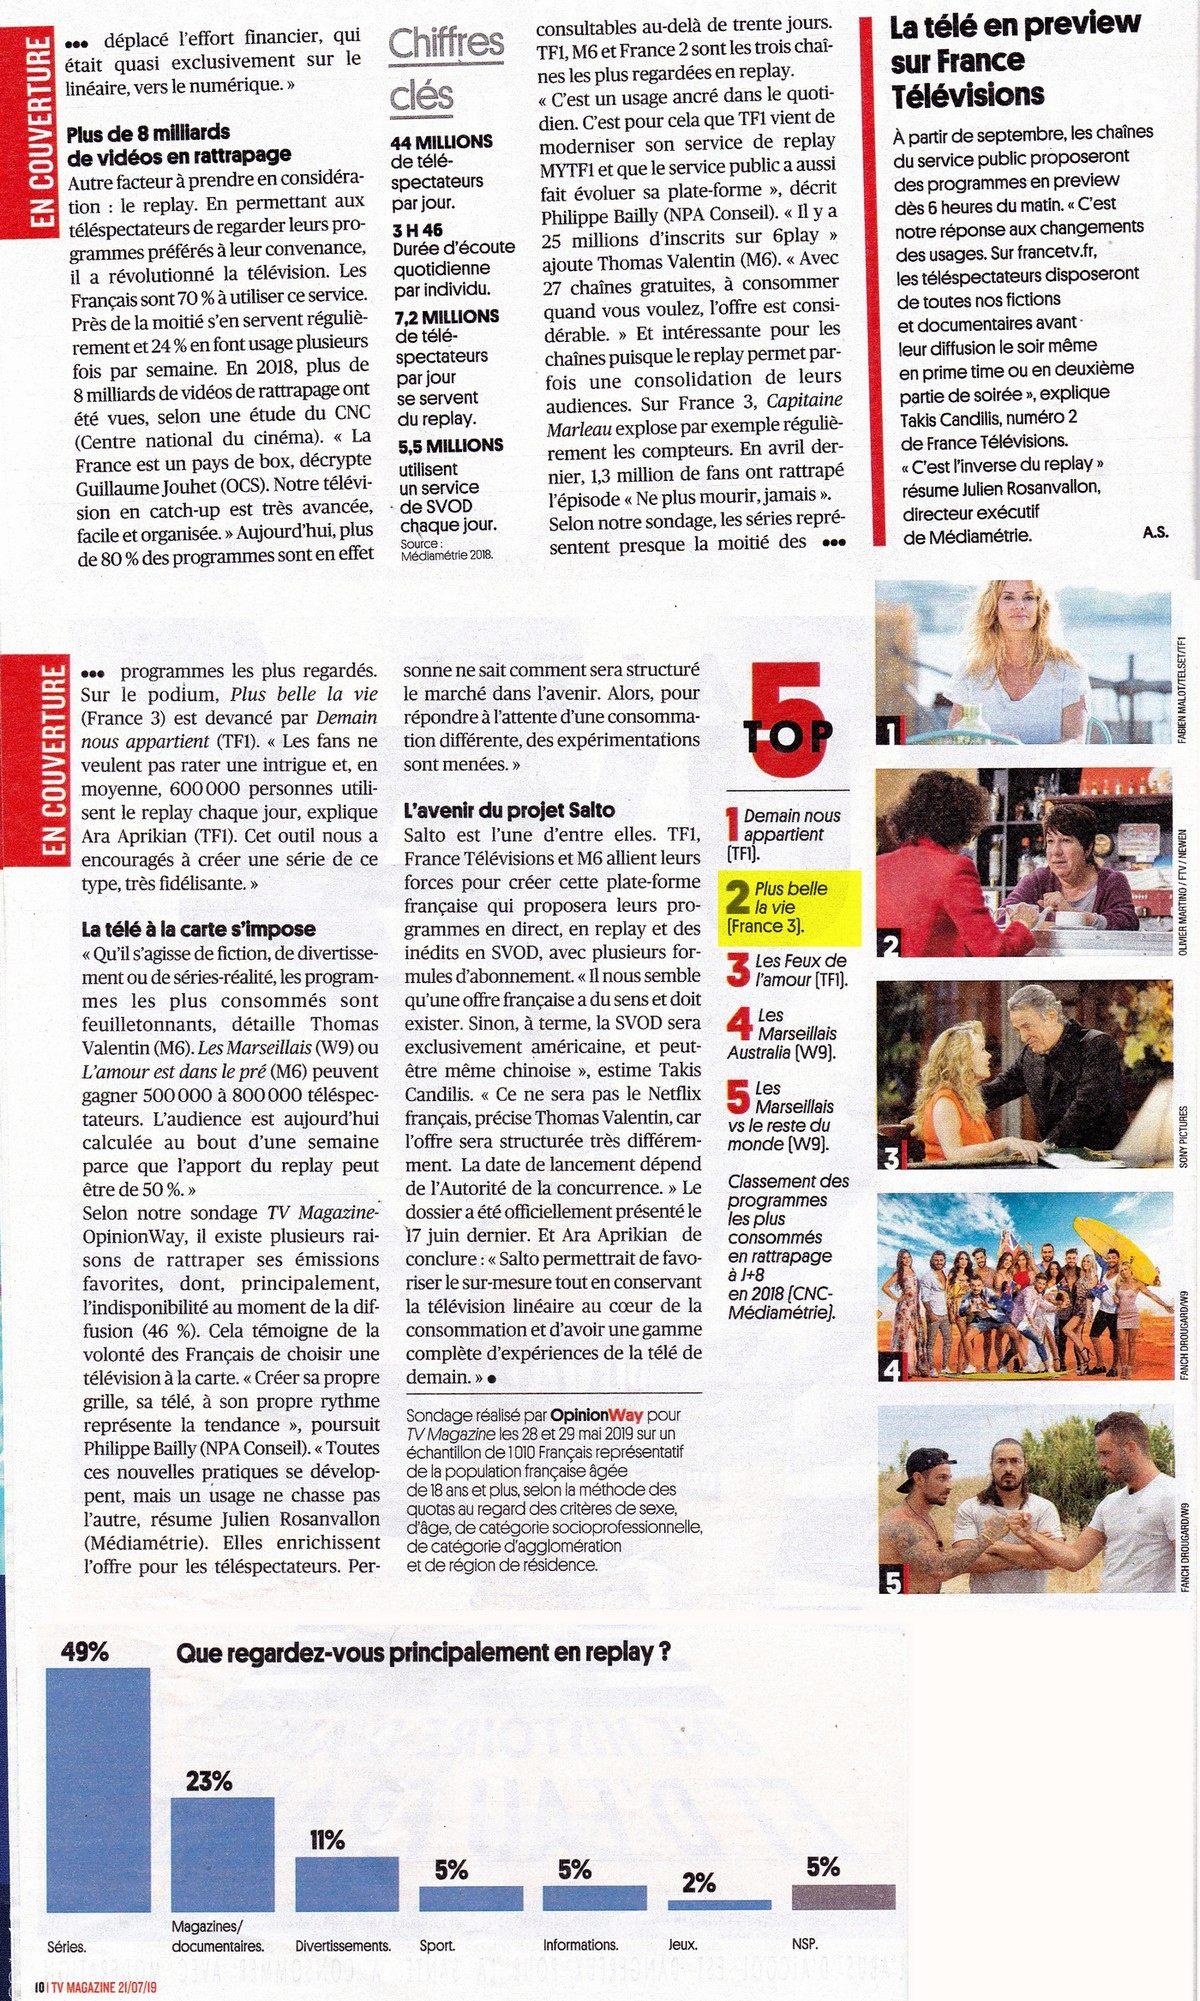 france.tv • PBLV en preview et REPLAY pendant 30 jours Pblv17